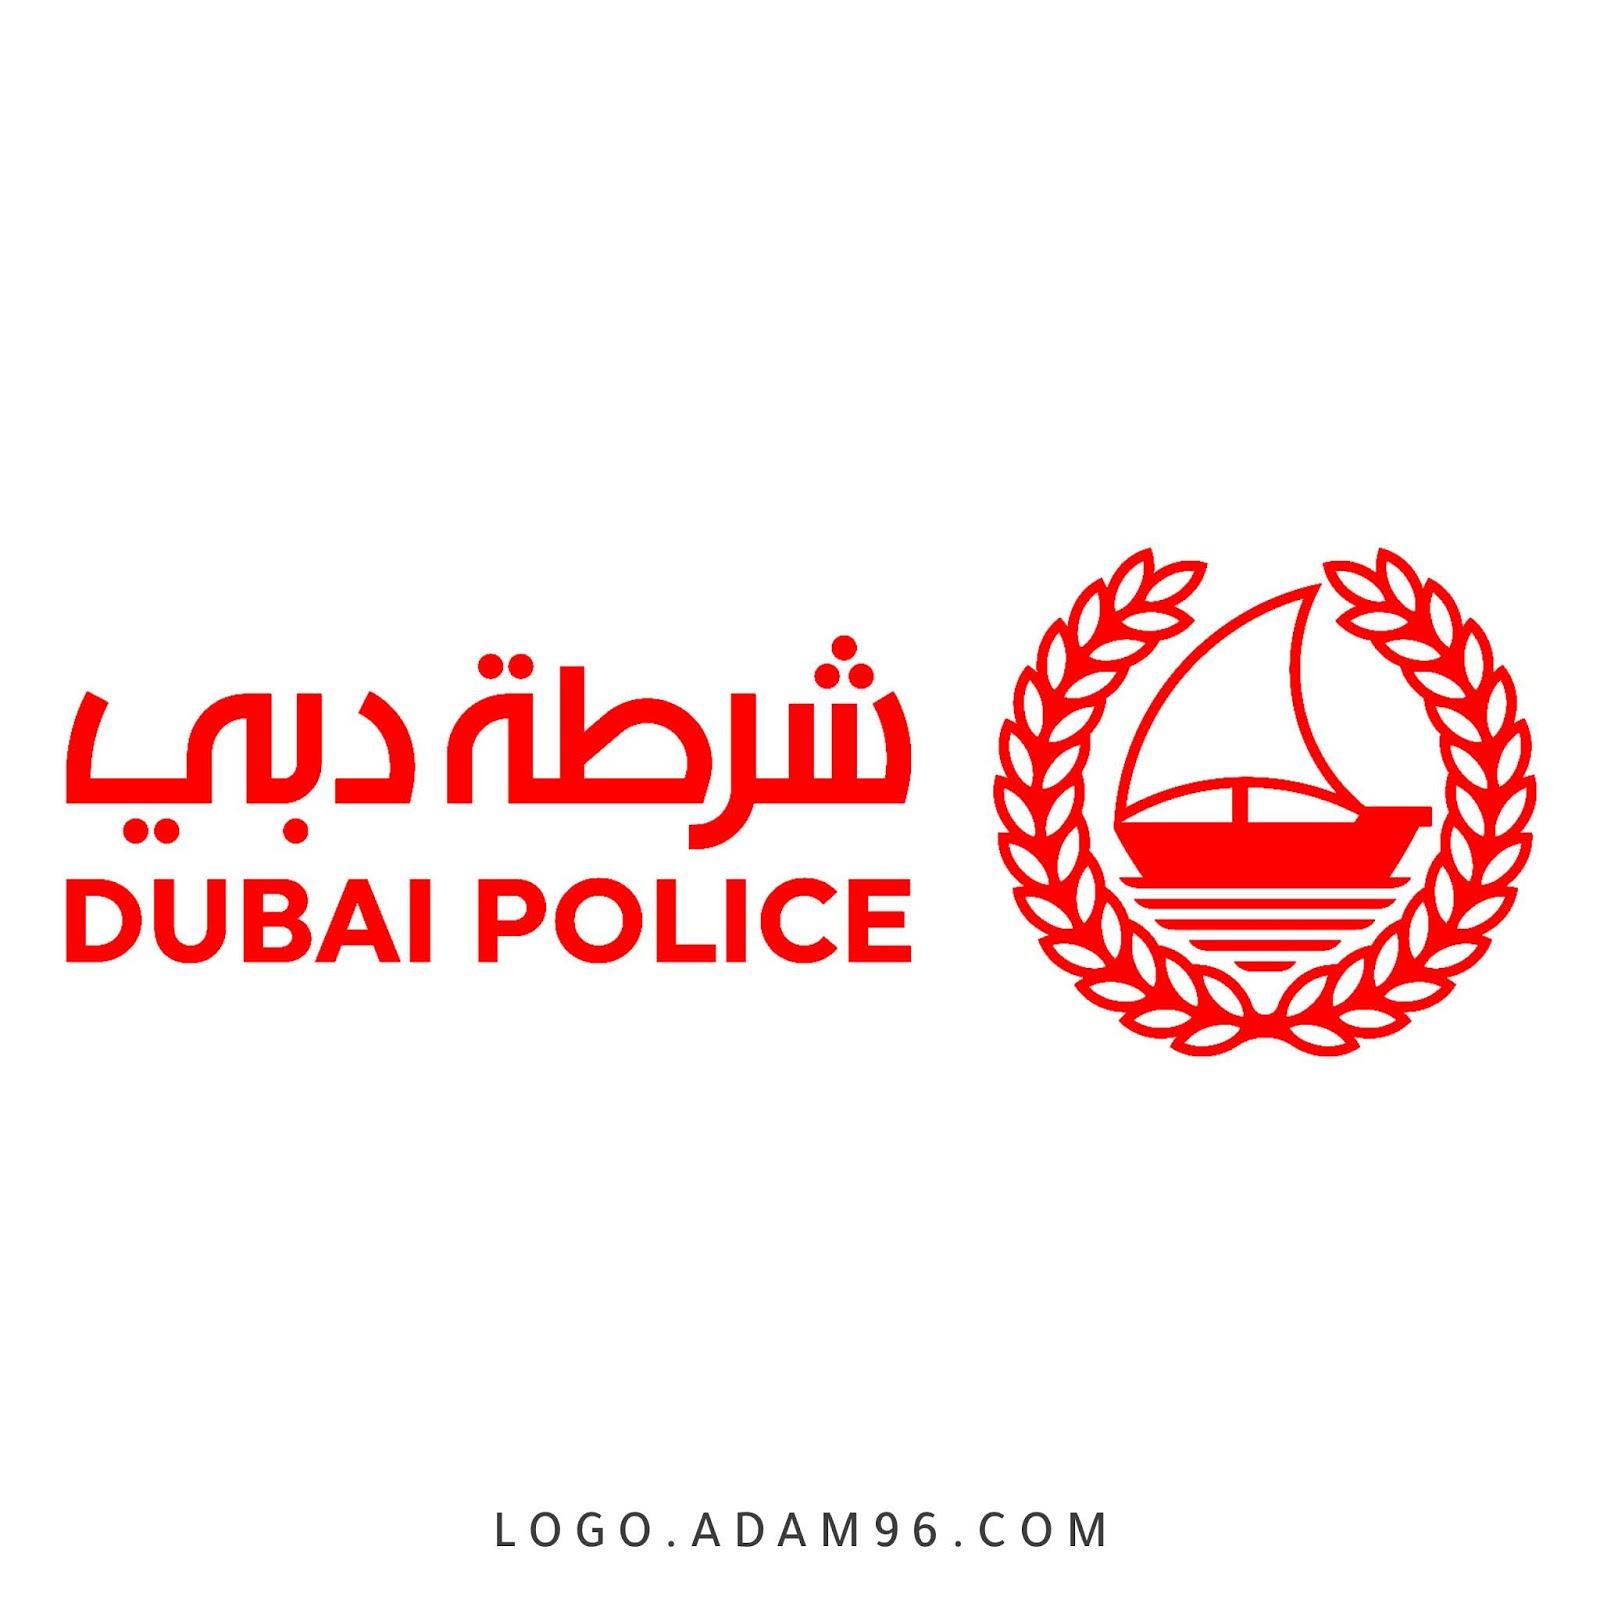 تحميل شعار شرطة دبي - Dubai Police png